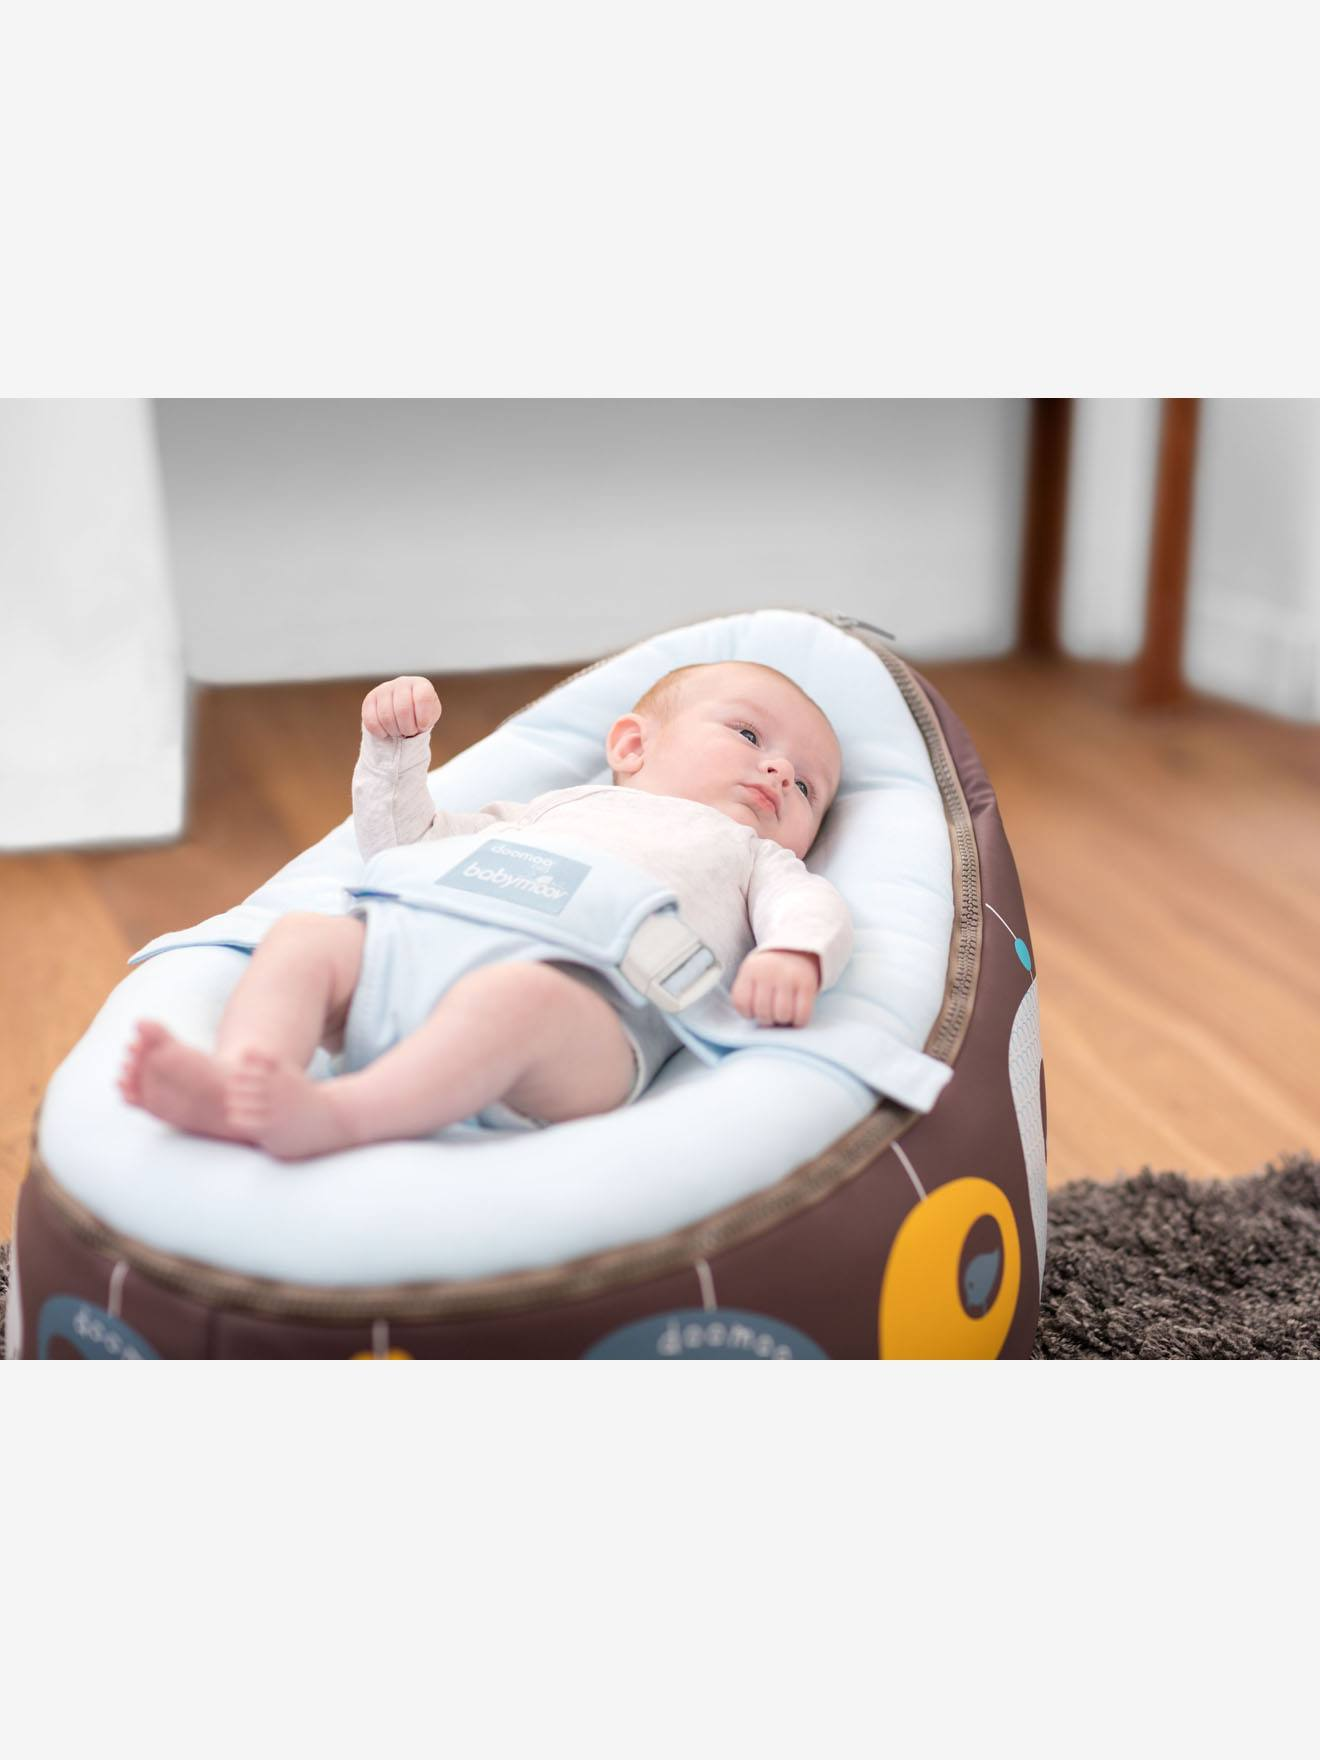 belle transat de bain ok baby id es de bain de soleil. Black Bedroom Furniture Sets. Home Design Ideas